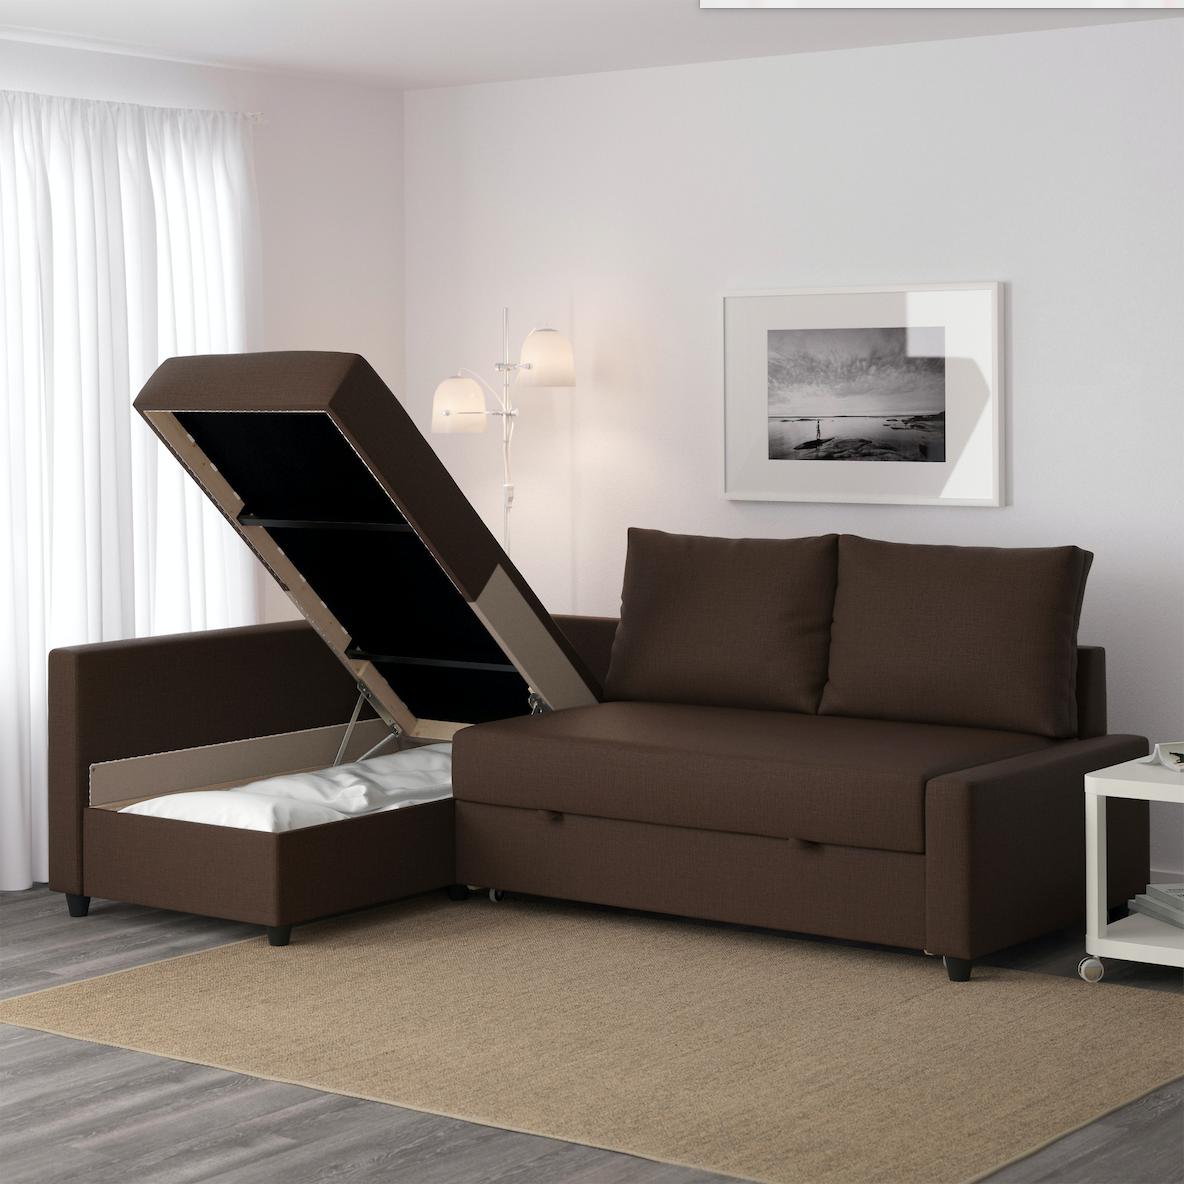 Decora tu salón con Ikea